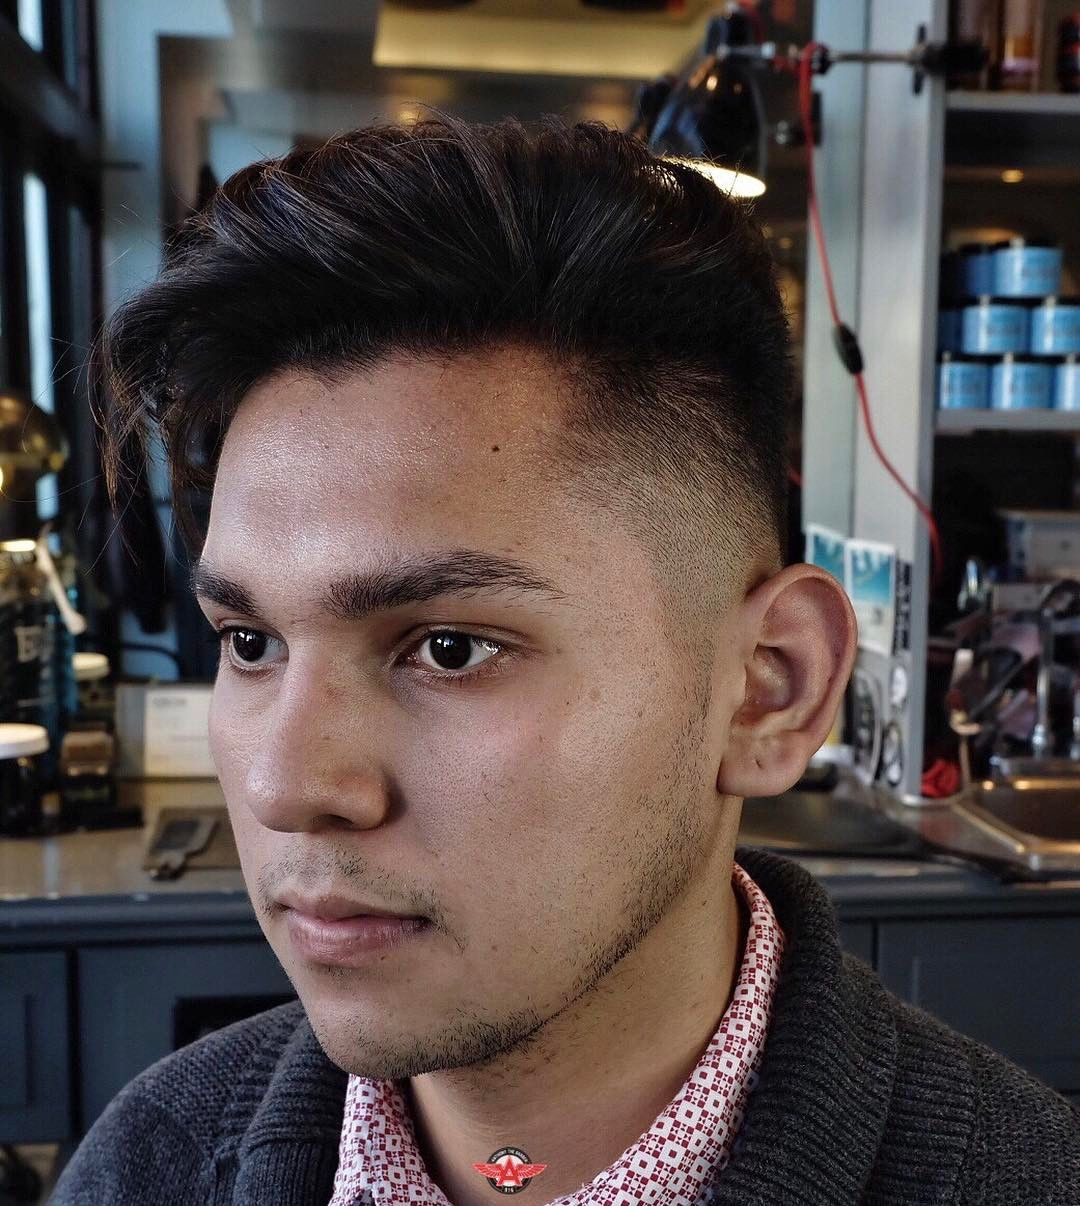 Pompadour Hairstyles For Men Pompadour Hairstyle And Pompadour